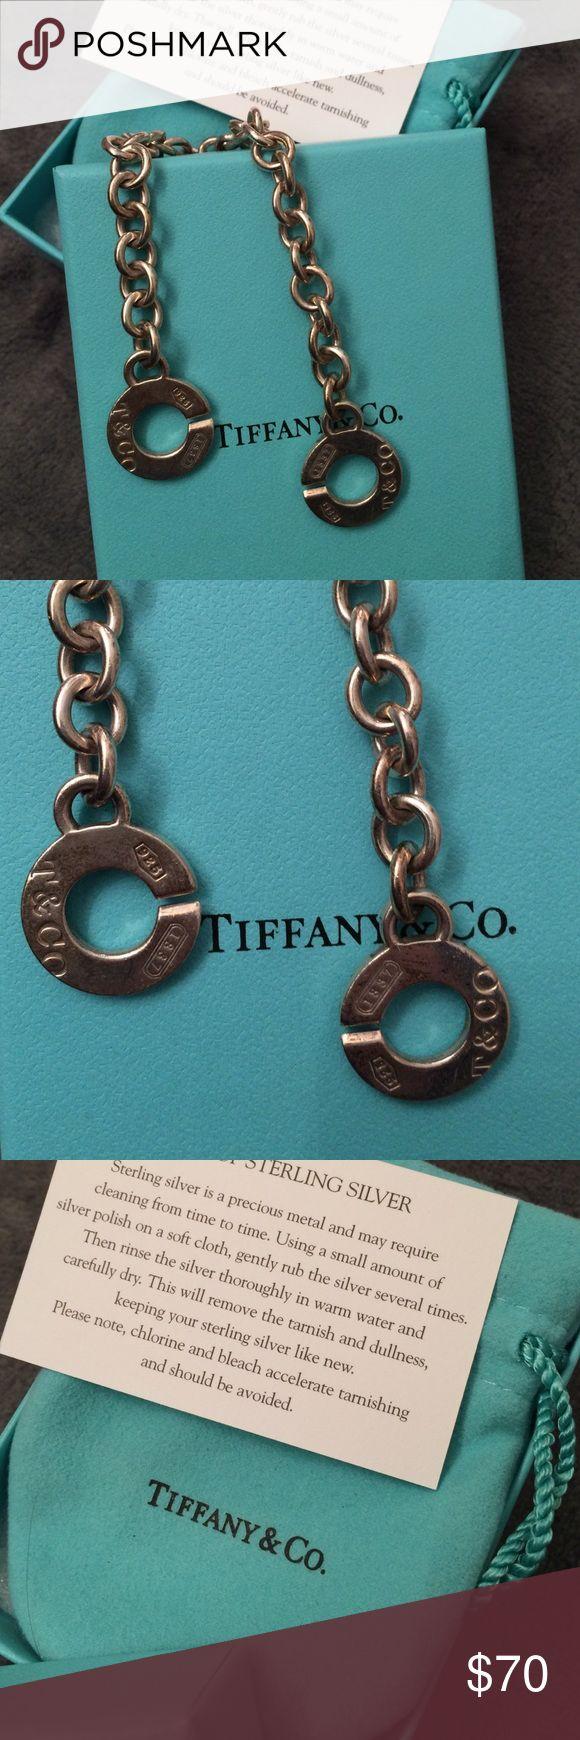 Tiffany and Co. charm bracelet Tiffany charm bracelet. Horseshoe hook clasp. Tiffany & Co. Jewelry Bracelets